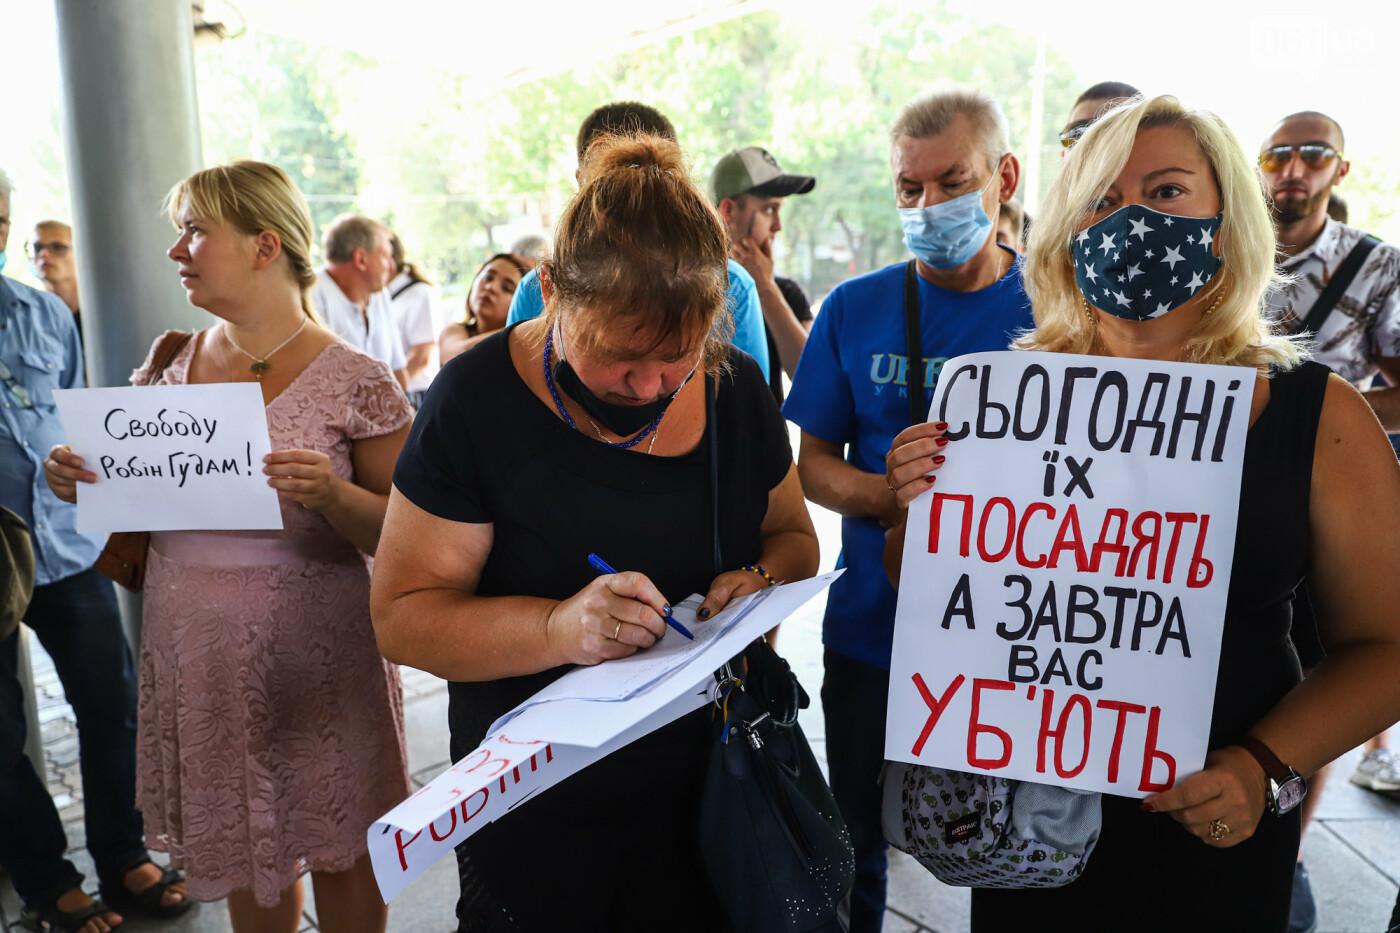 """Захист країни - не злочин"": в Запорожье патриоты провели митинг у стен нацполиции, - ФОТОРЕПОРТАЖ , фото-23"